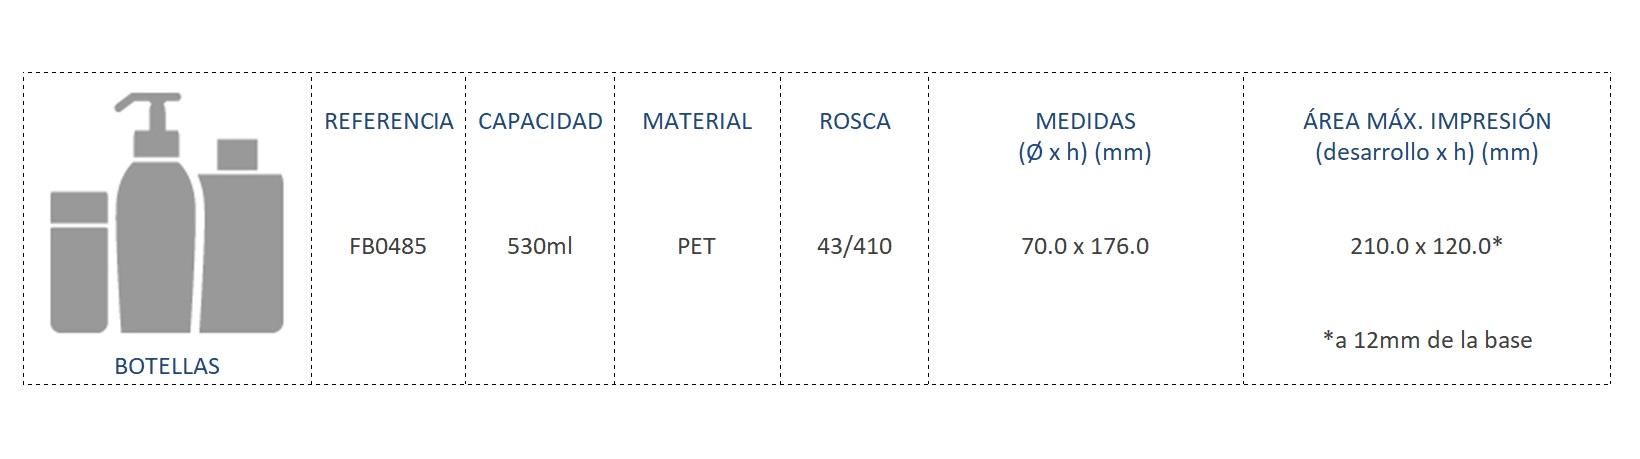 Cuadro de materiales botella FB0485